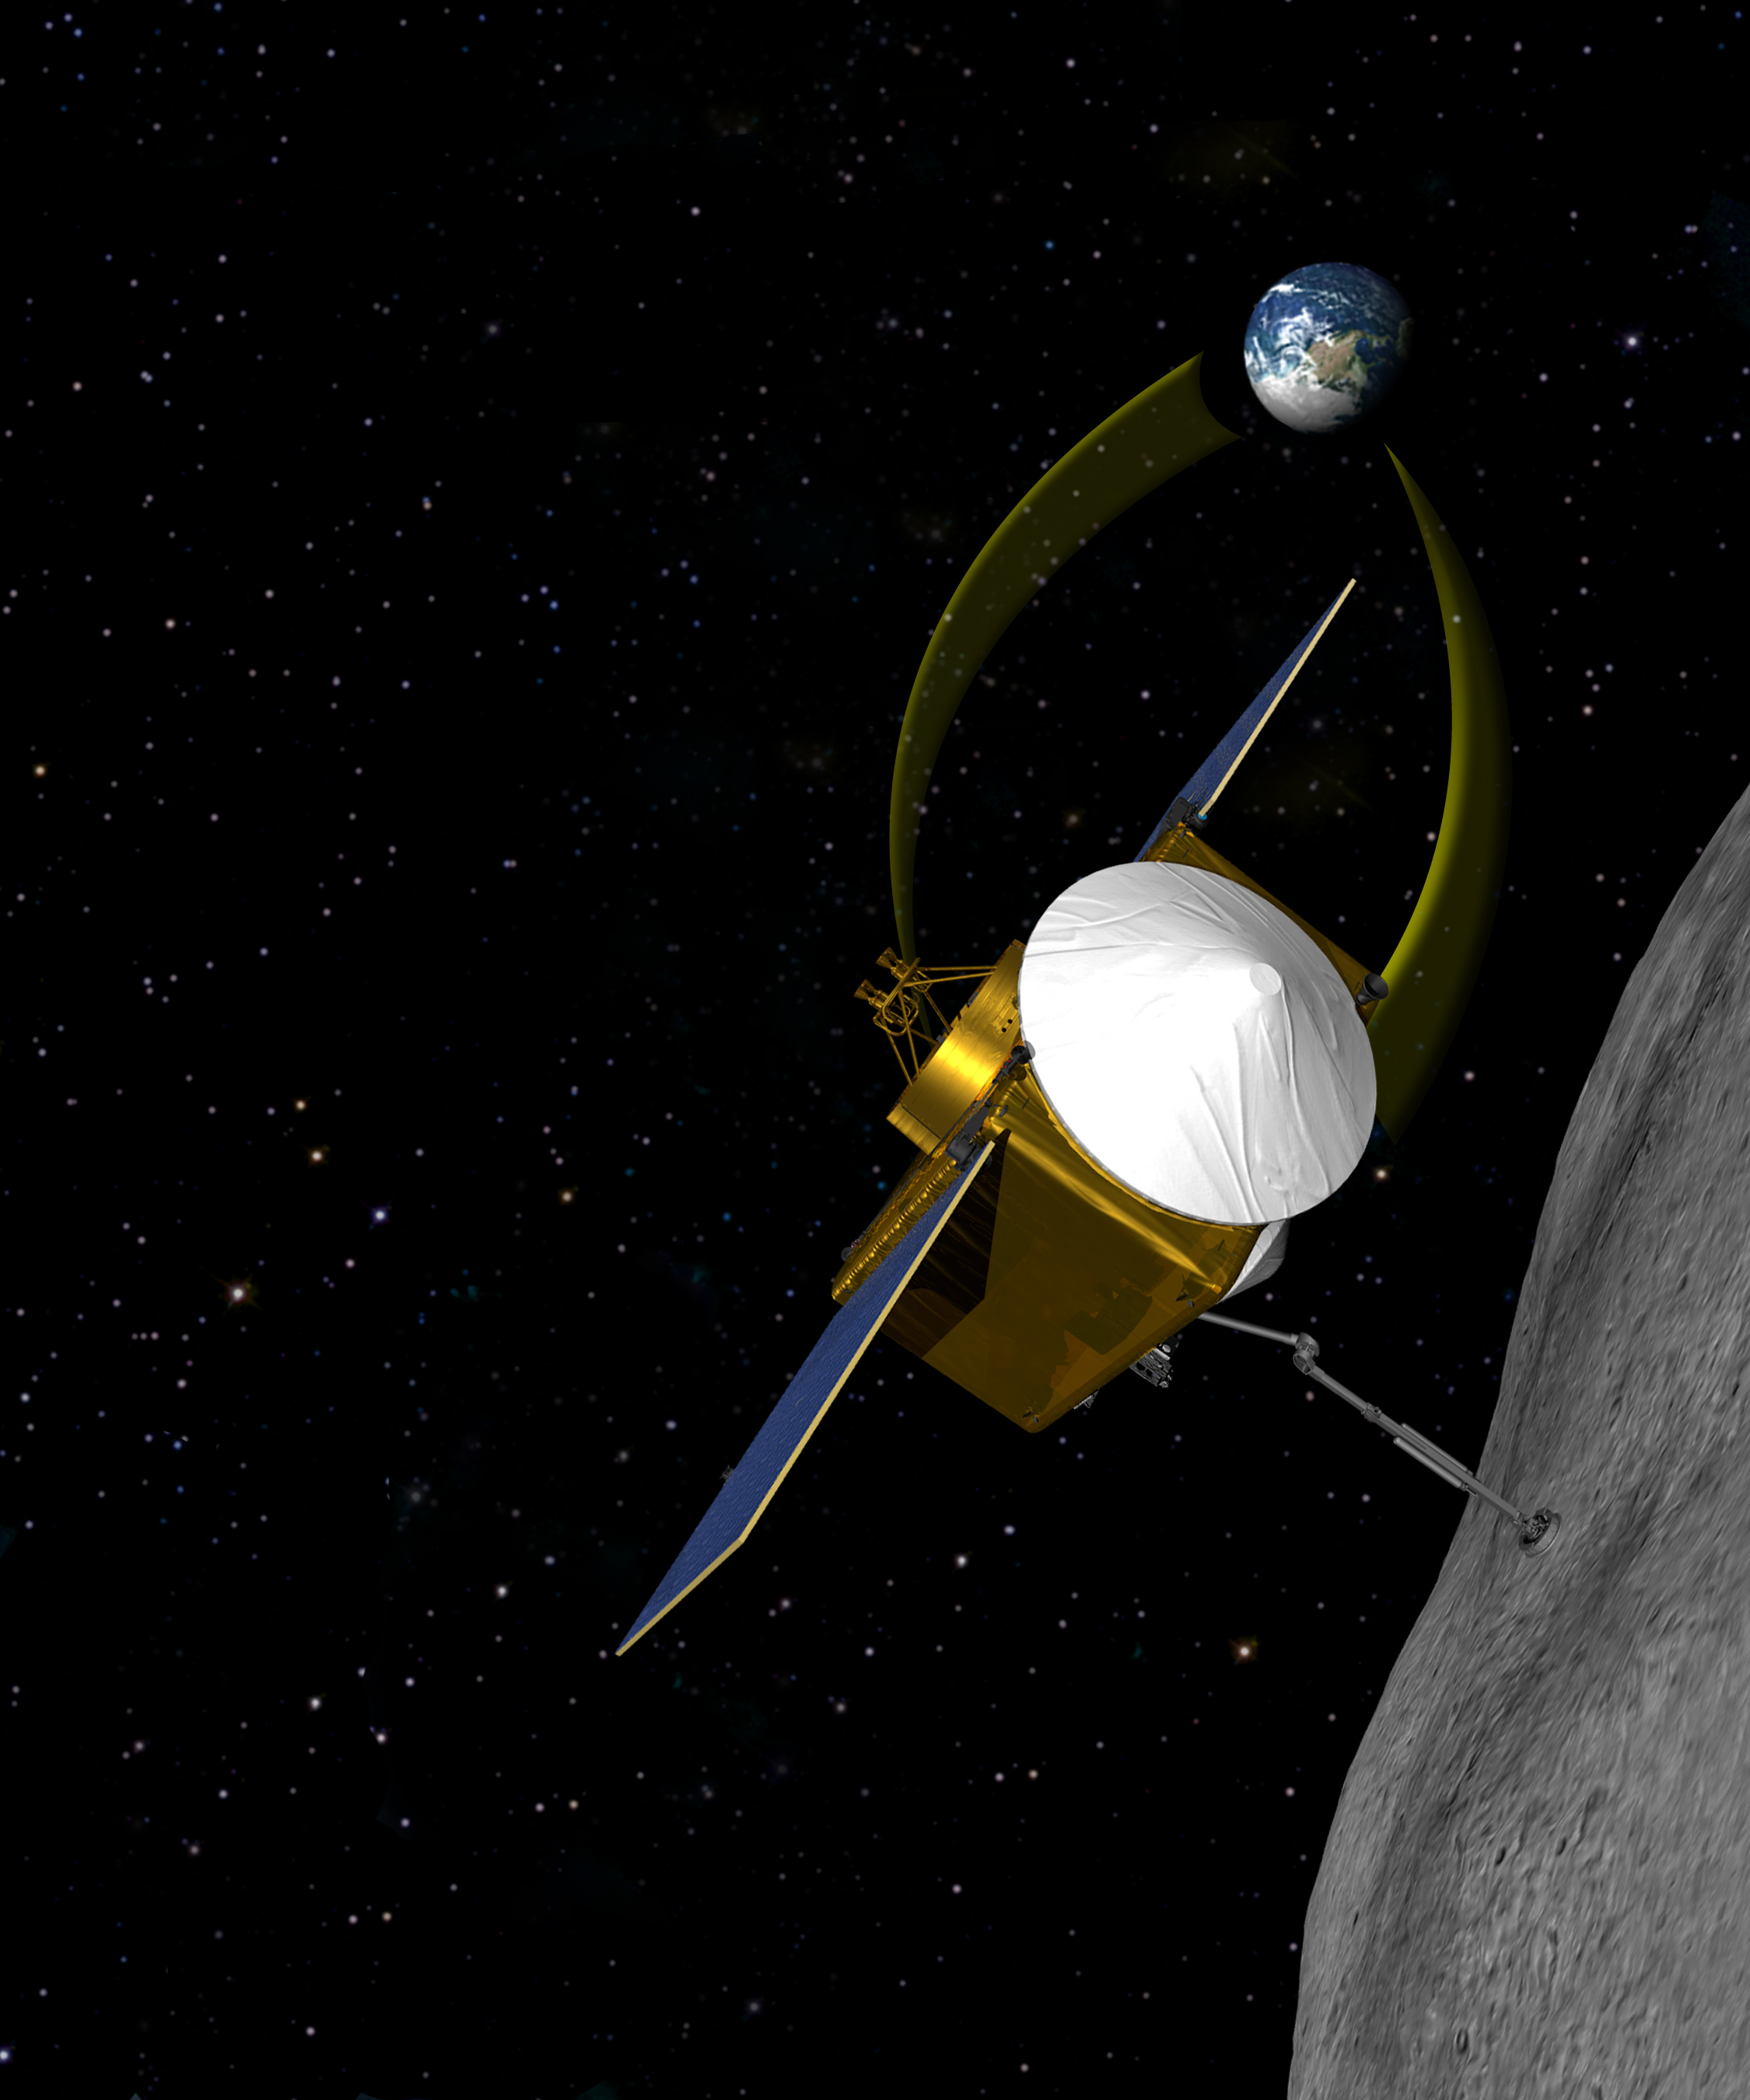 NASA sending robotic spacecraft to asteroid in 2016 ...